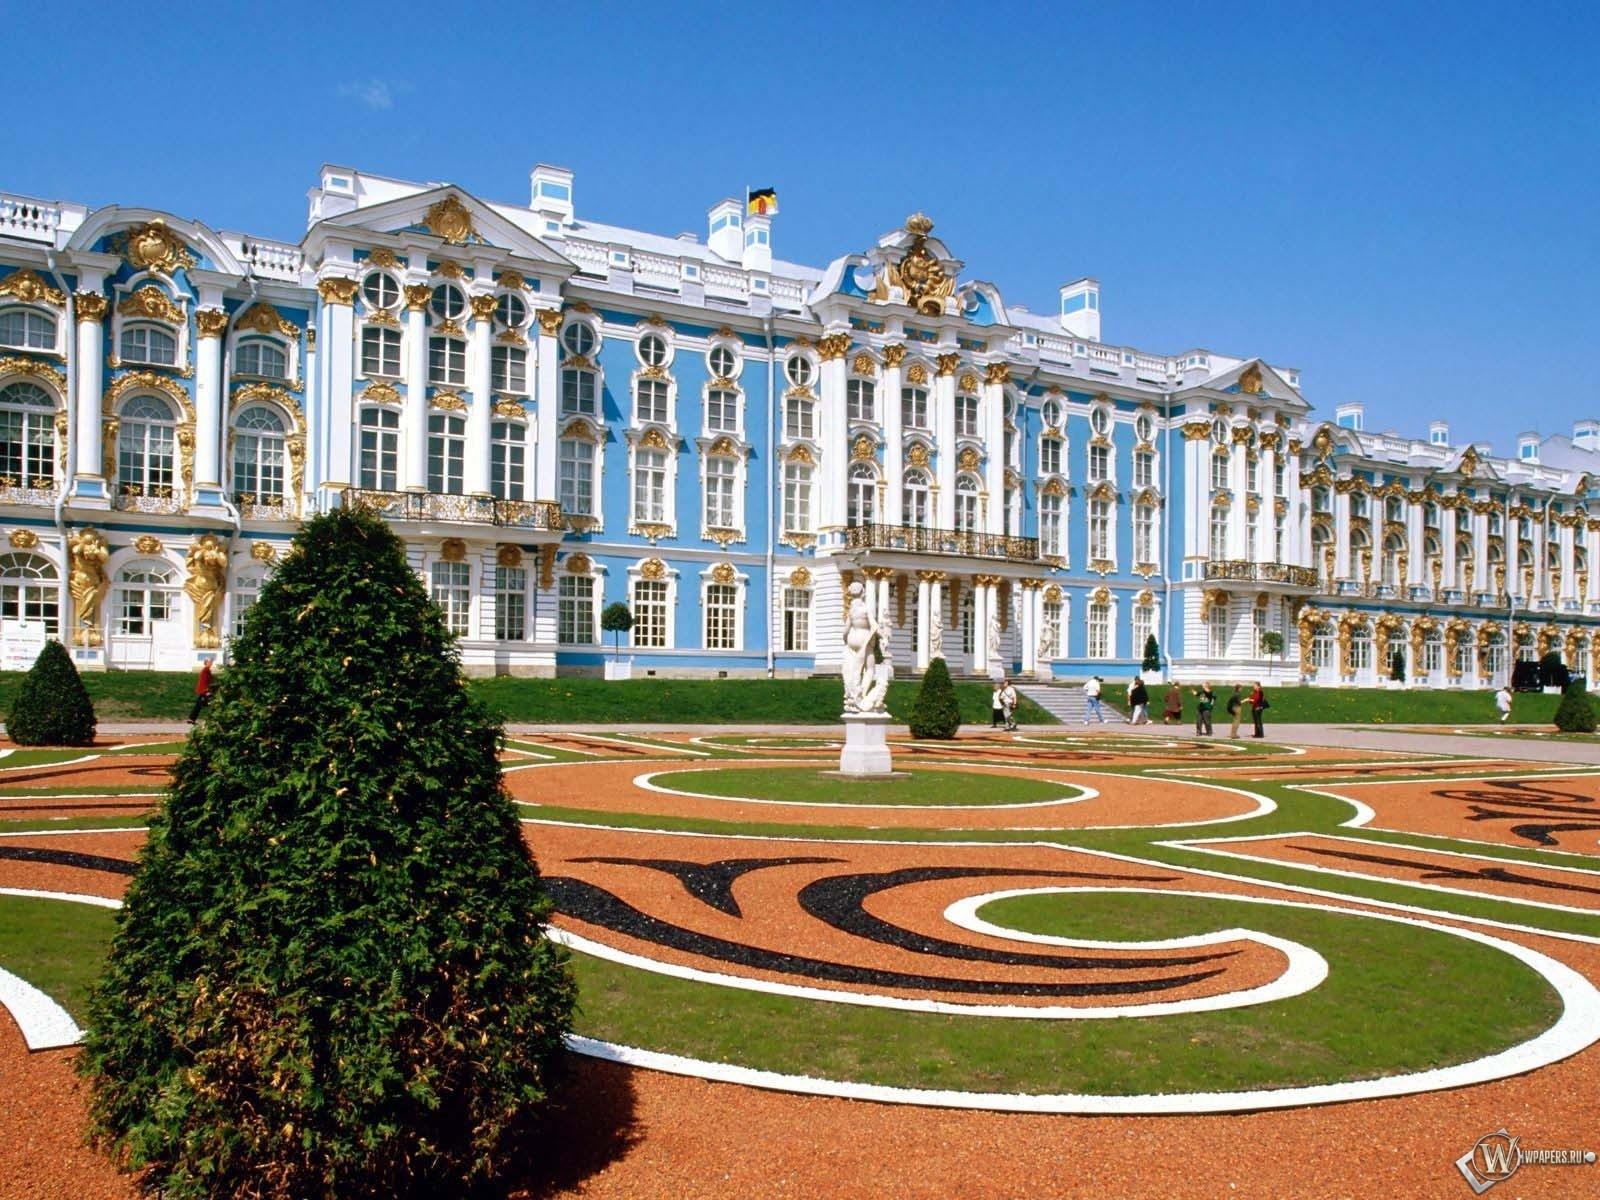 Усадьба Санкт-Петербург 1600x1200